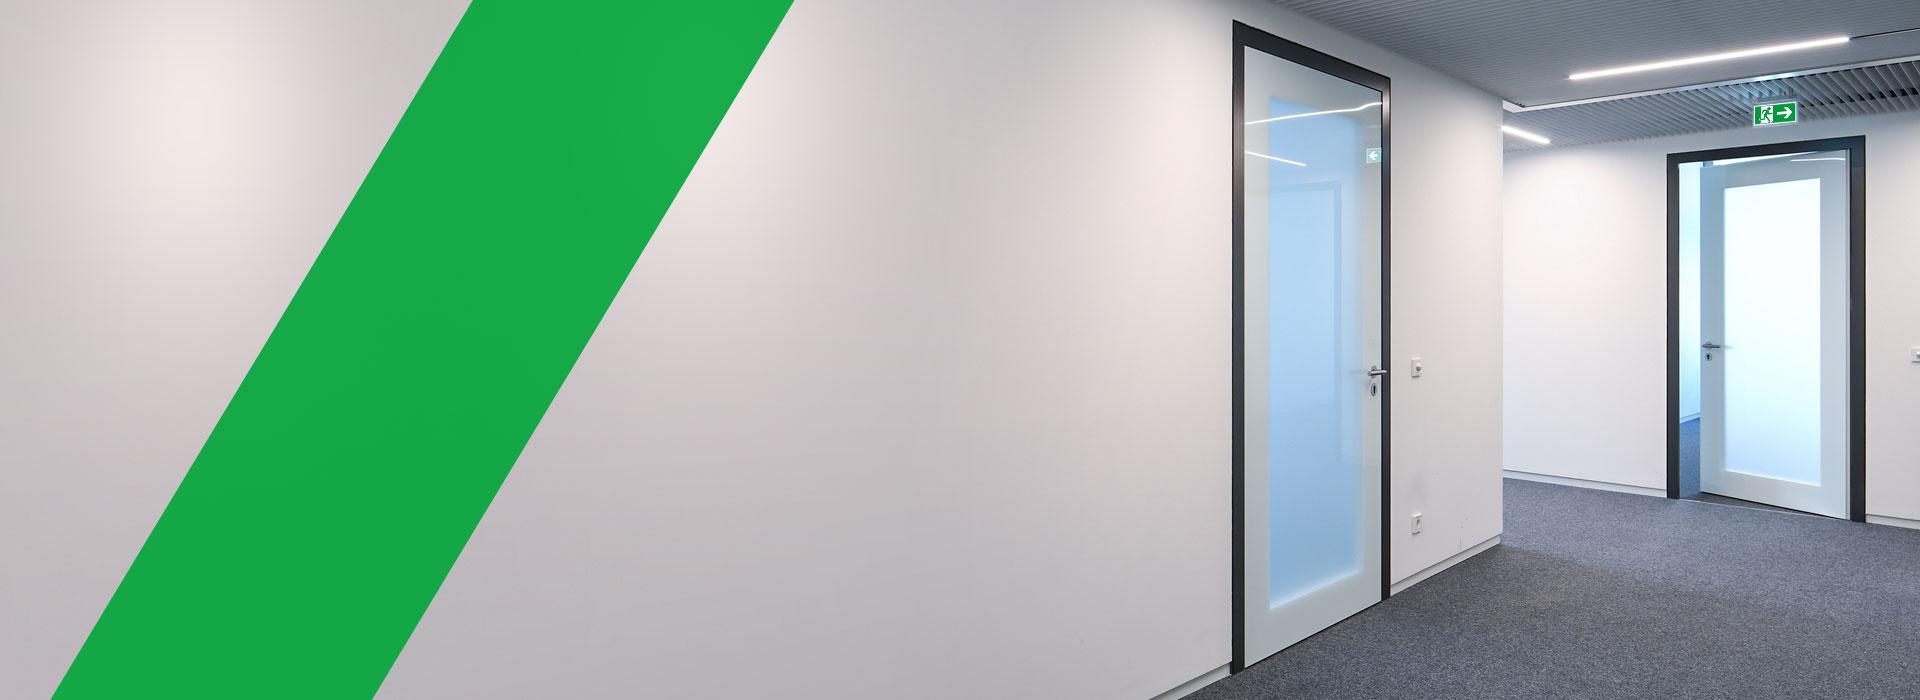 AZ Metallbau, Heldrungen Thüringen, Aluminiumzargen, Zargen, Sondertüren, Sondertürelemente, Verglasung, Verglasungselemente, Glaswände, Glastrennwand, Türelemente, Wandbündige Zargen